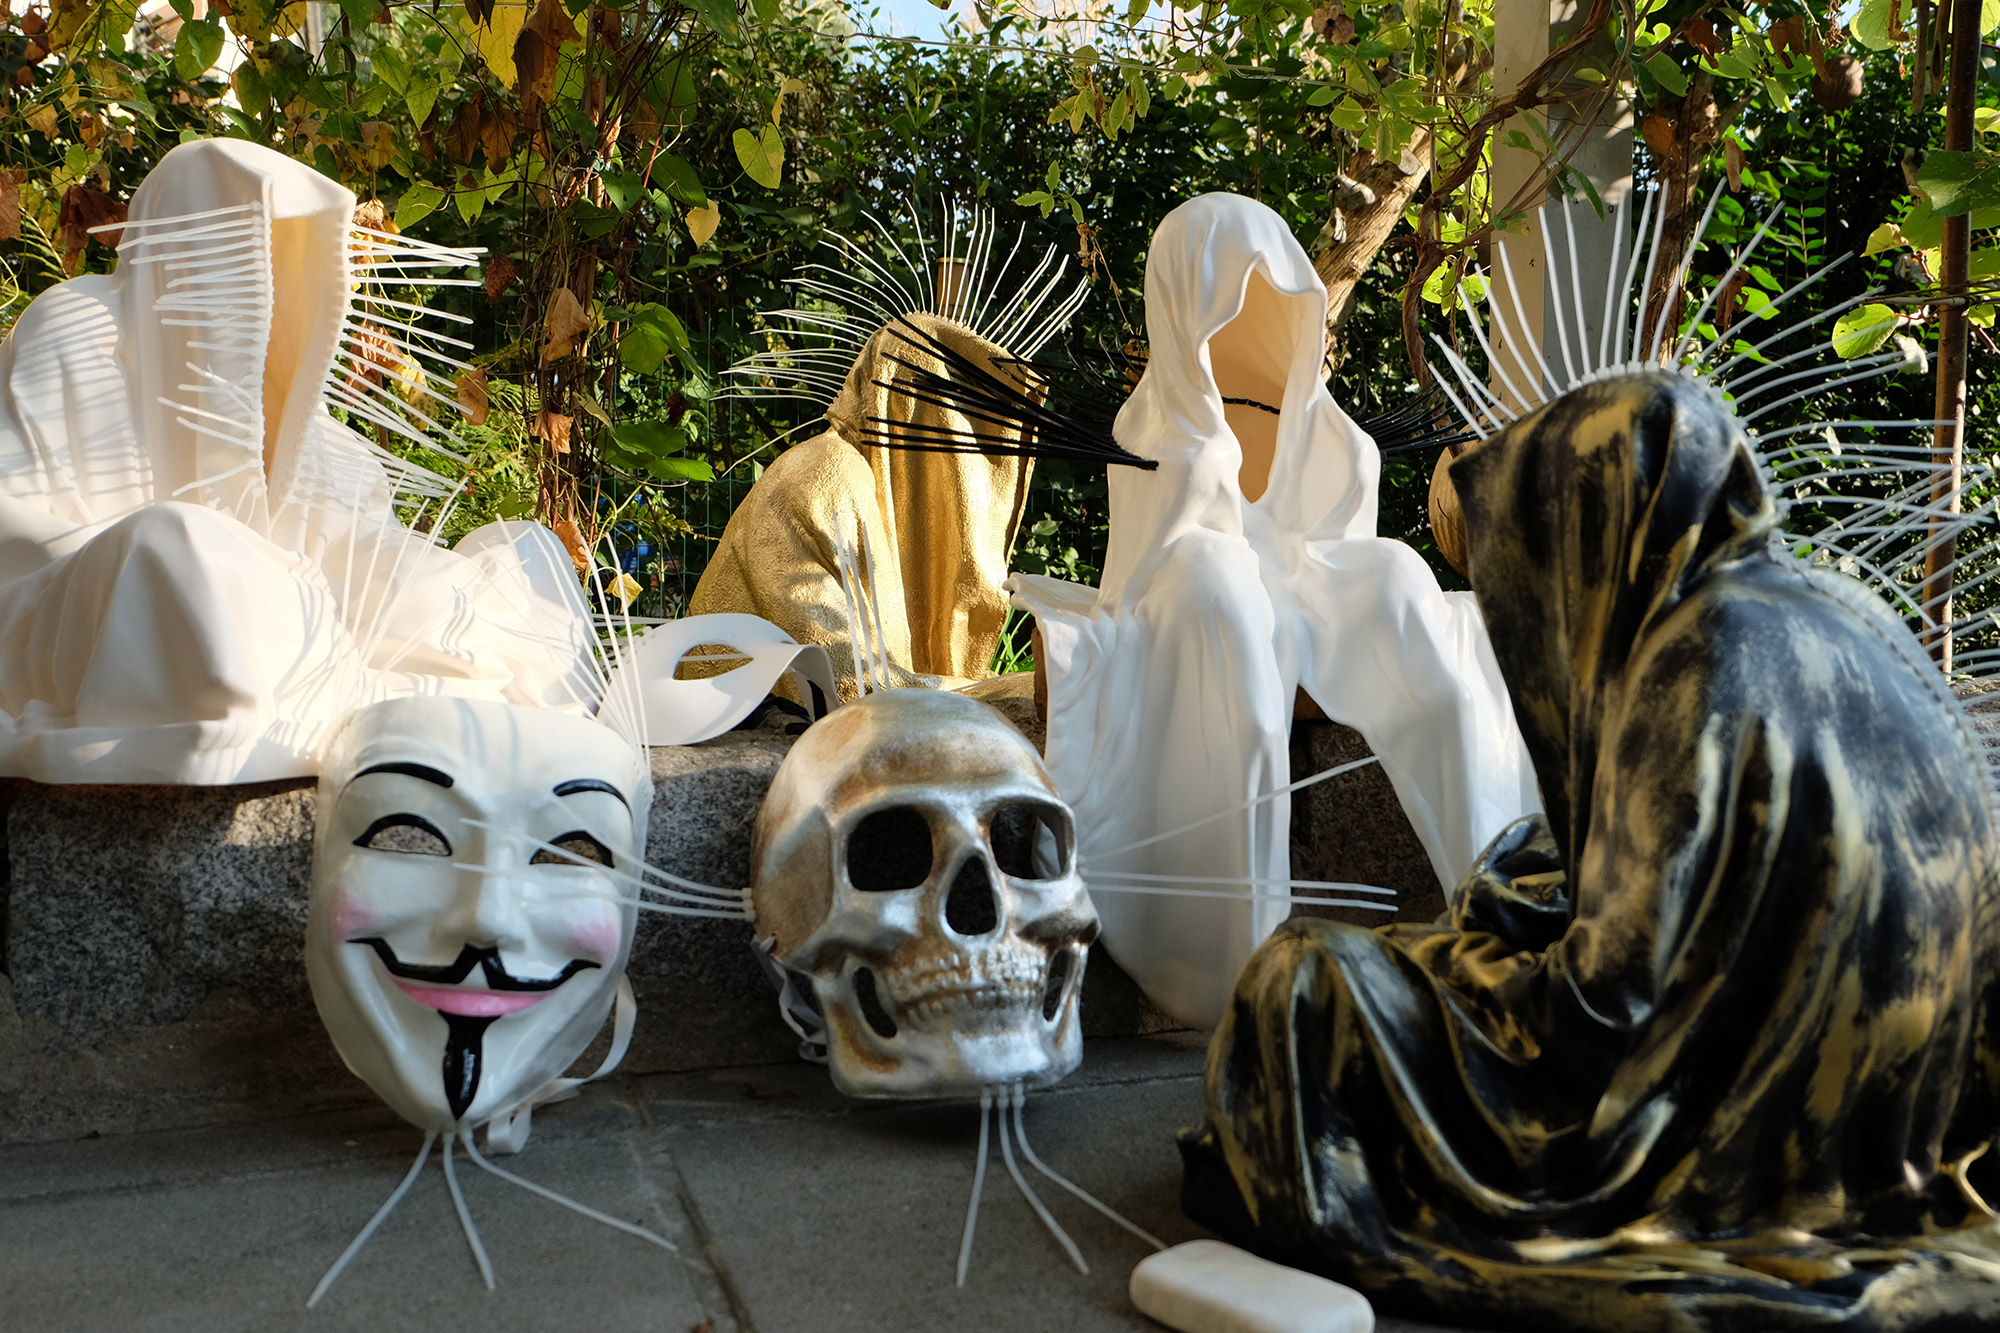 #faceless-#mask-#cableties-#ziptie-ty-#guardiansoftime-#manfredkielnhofer-#contemporaryart-#arts-#design-#sculpture-#statue-#museum-#gallery-#fineart-#lightart-#ghost-#anonymous-8083